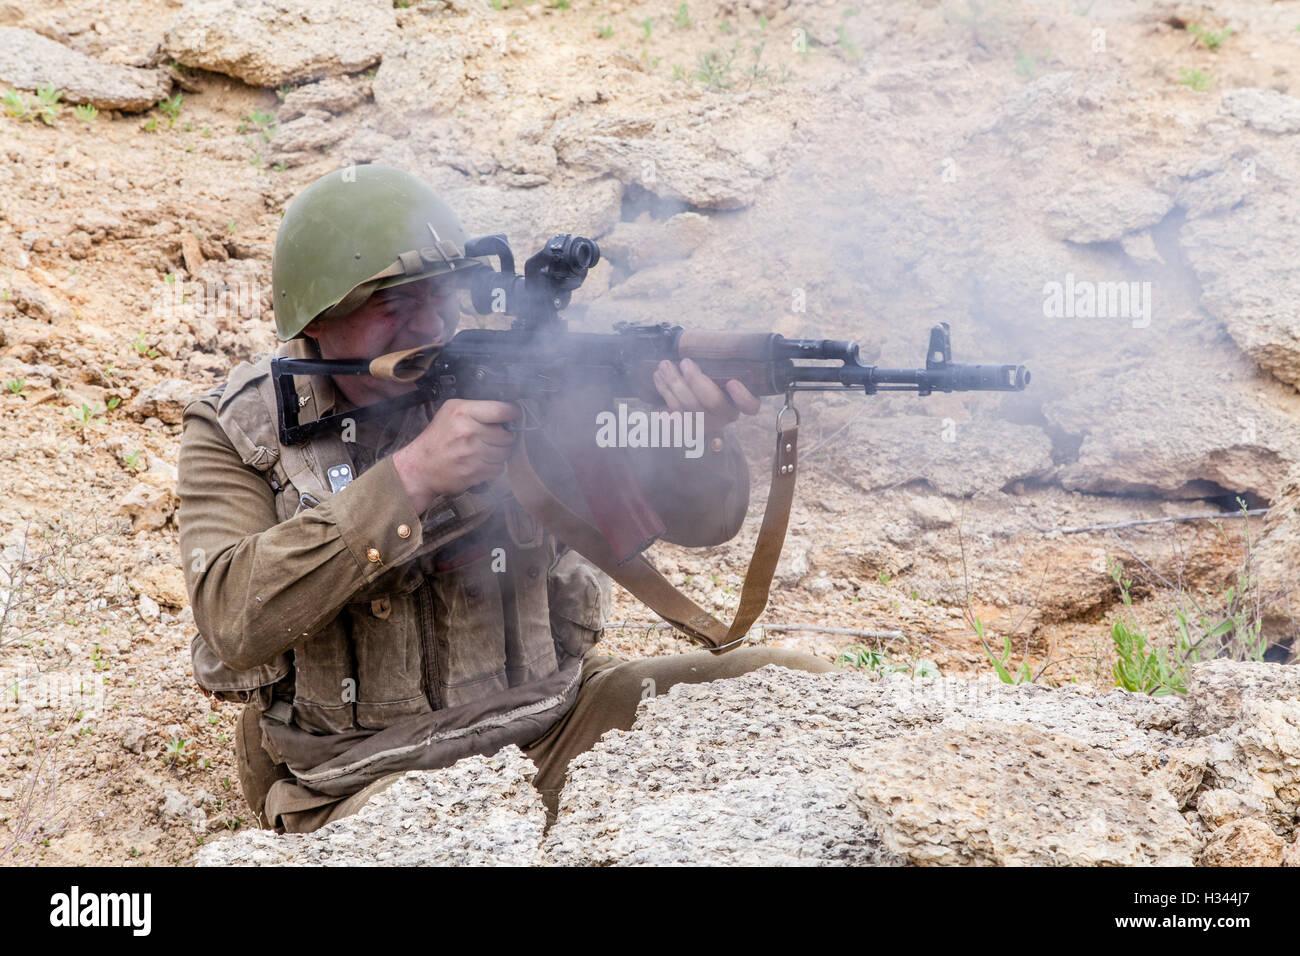 Soviet Afghanistan war - Page 6 Soviet-paratrooper-in-afghanistan-H344J7